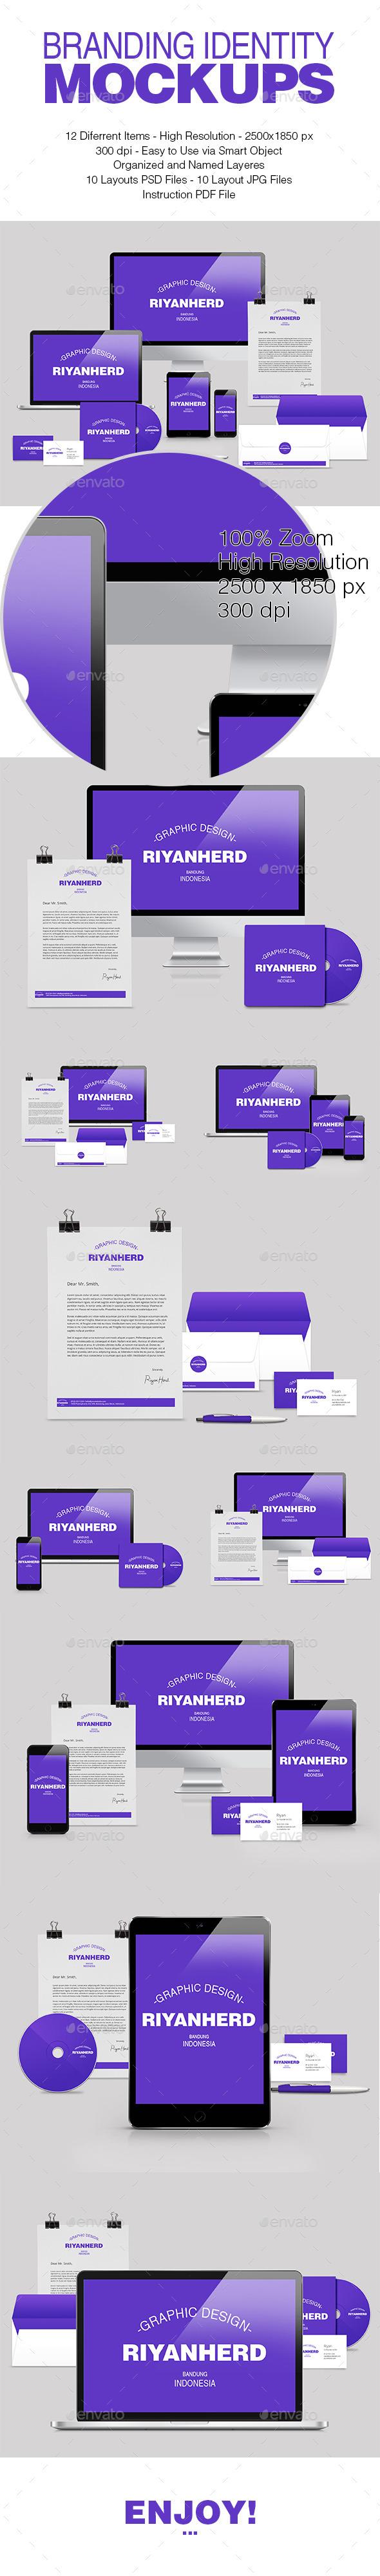 GraphicRiver Branding Identity Mockups 11342225